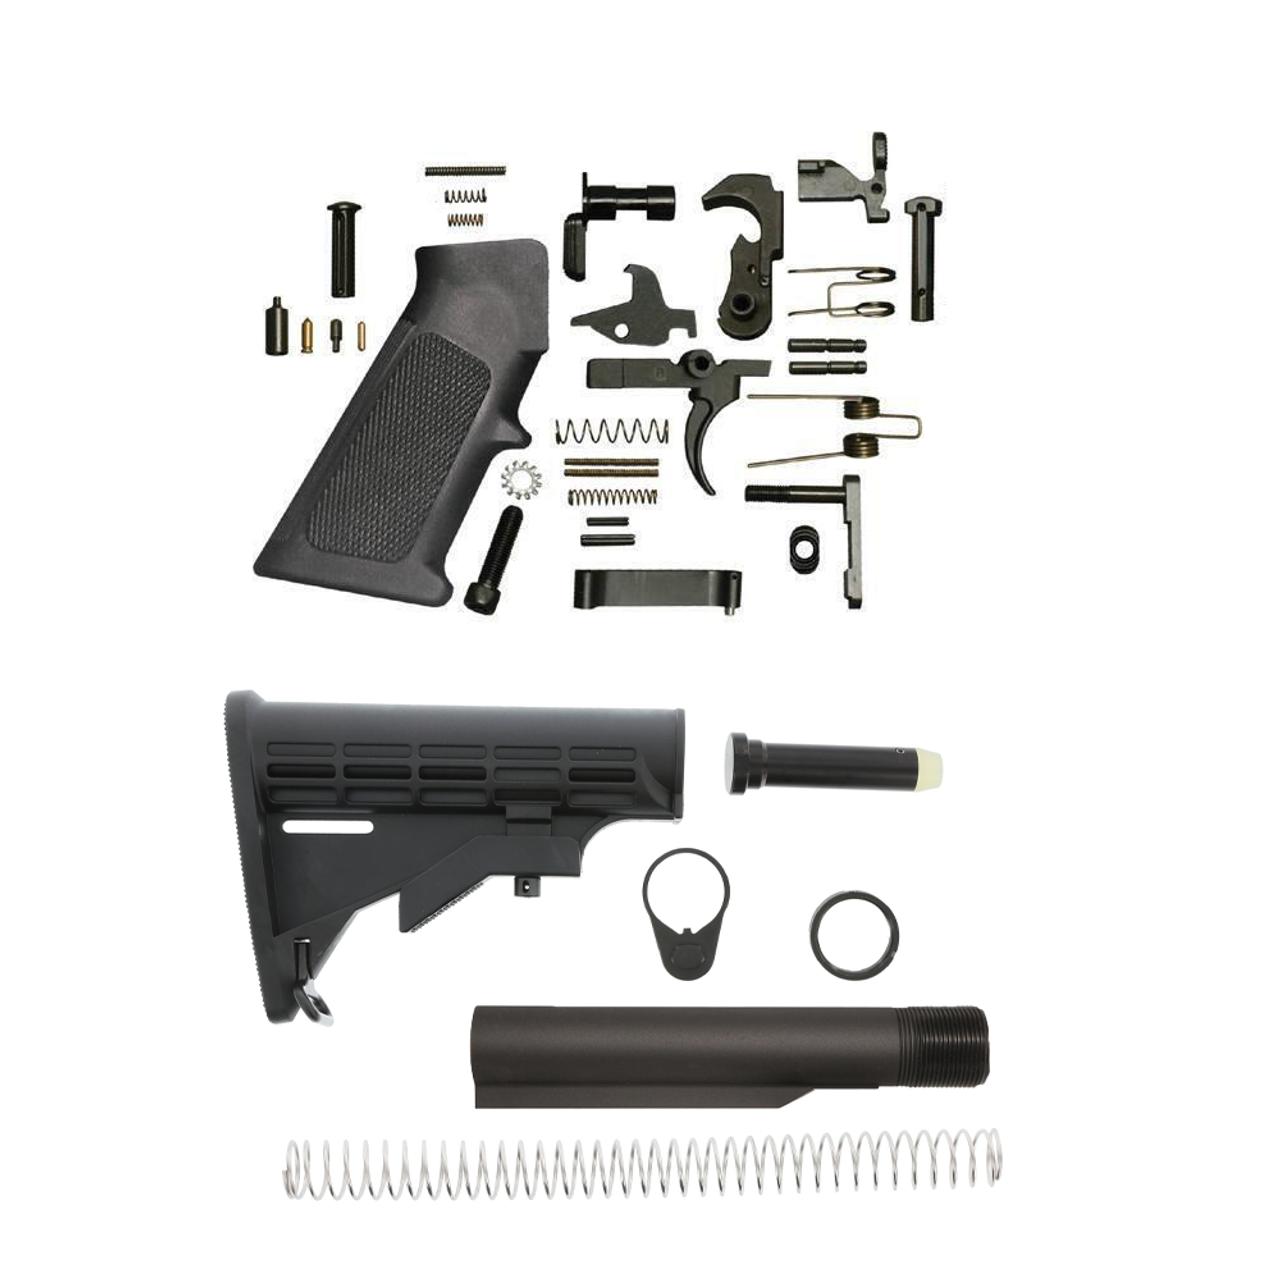 AR 15 Lower Build kit, AR 15 Lower Kit, AR 15 Lower Parts